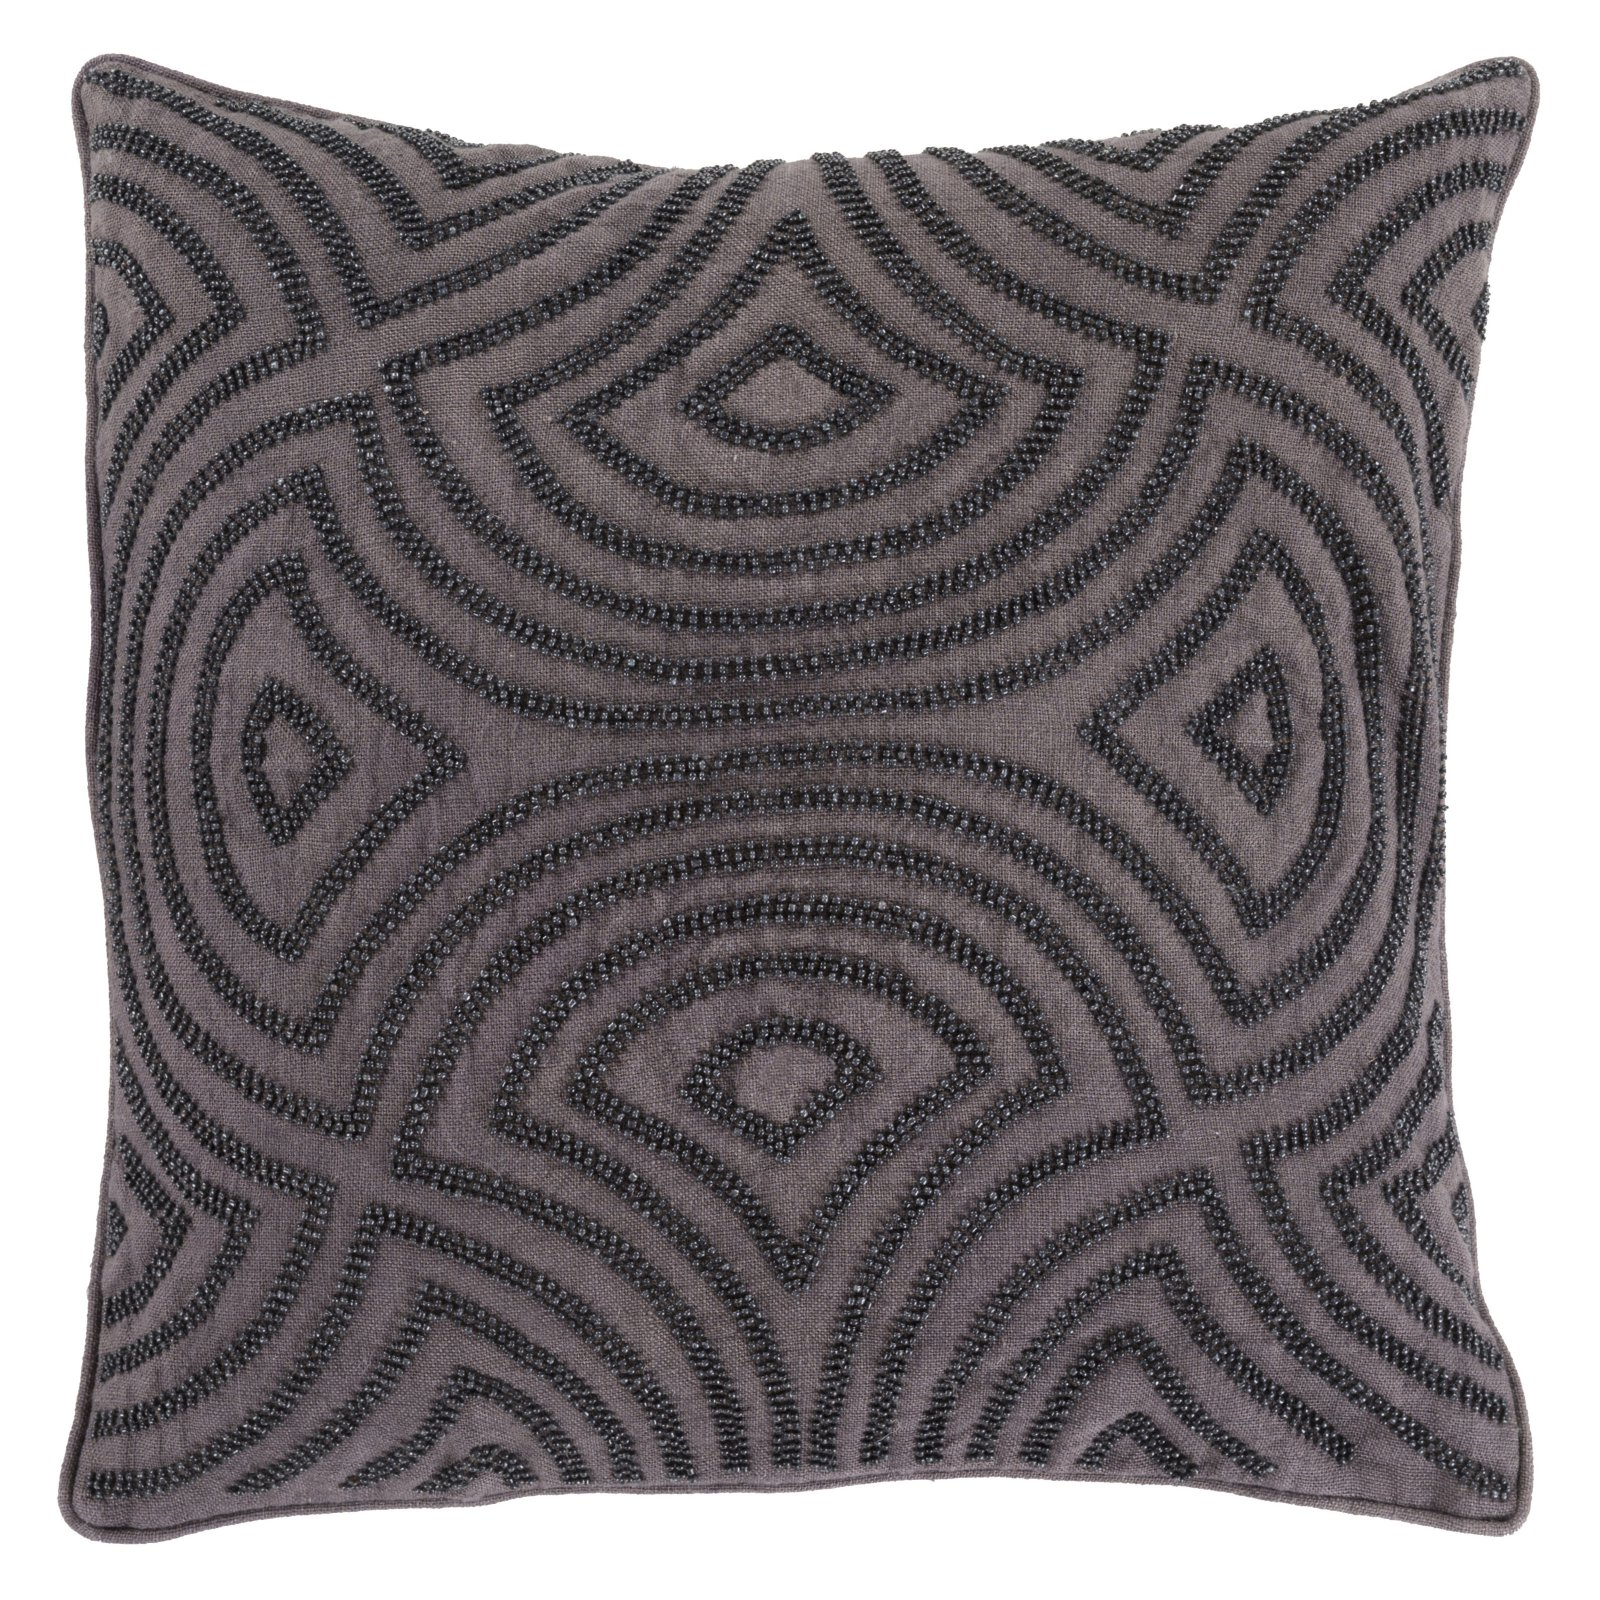 Surya Linen and Beads Decorative Pillow